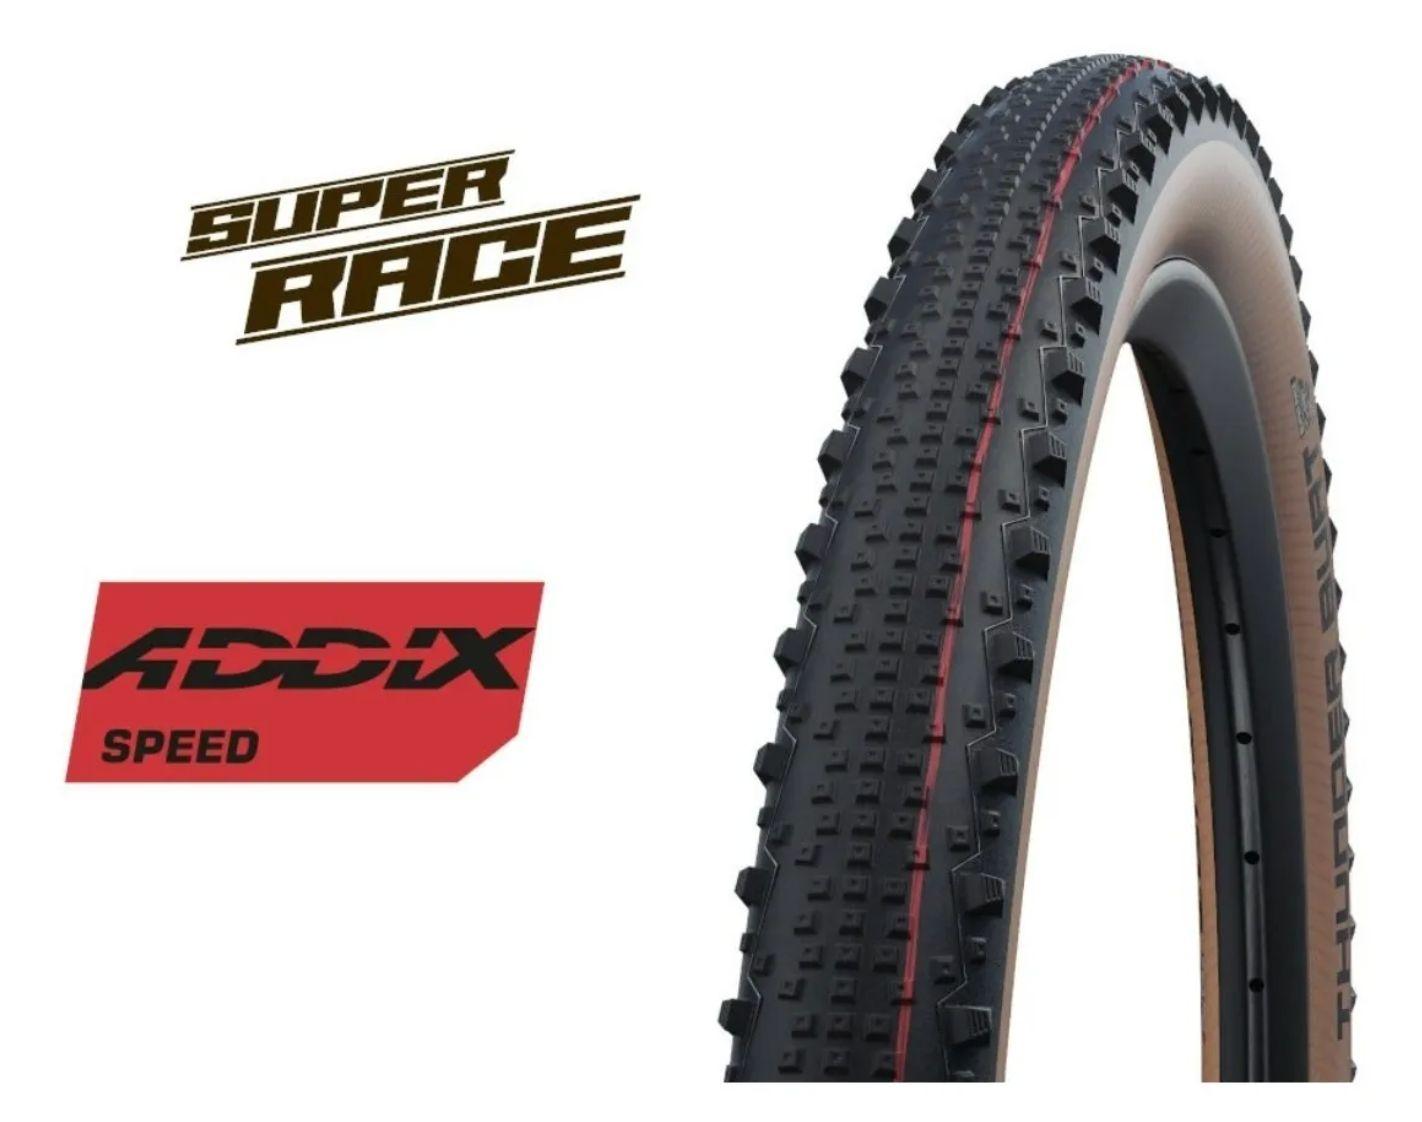 Pneu Schwalbe Thunder Burt Super Race Addix 29x2.35 Snakeski